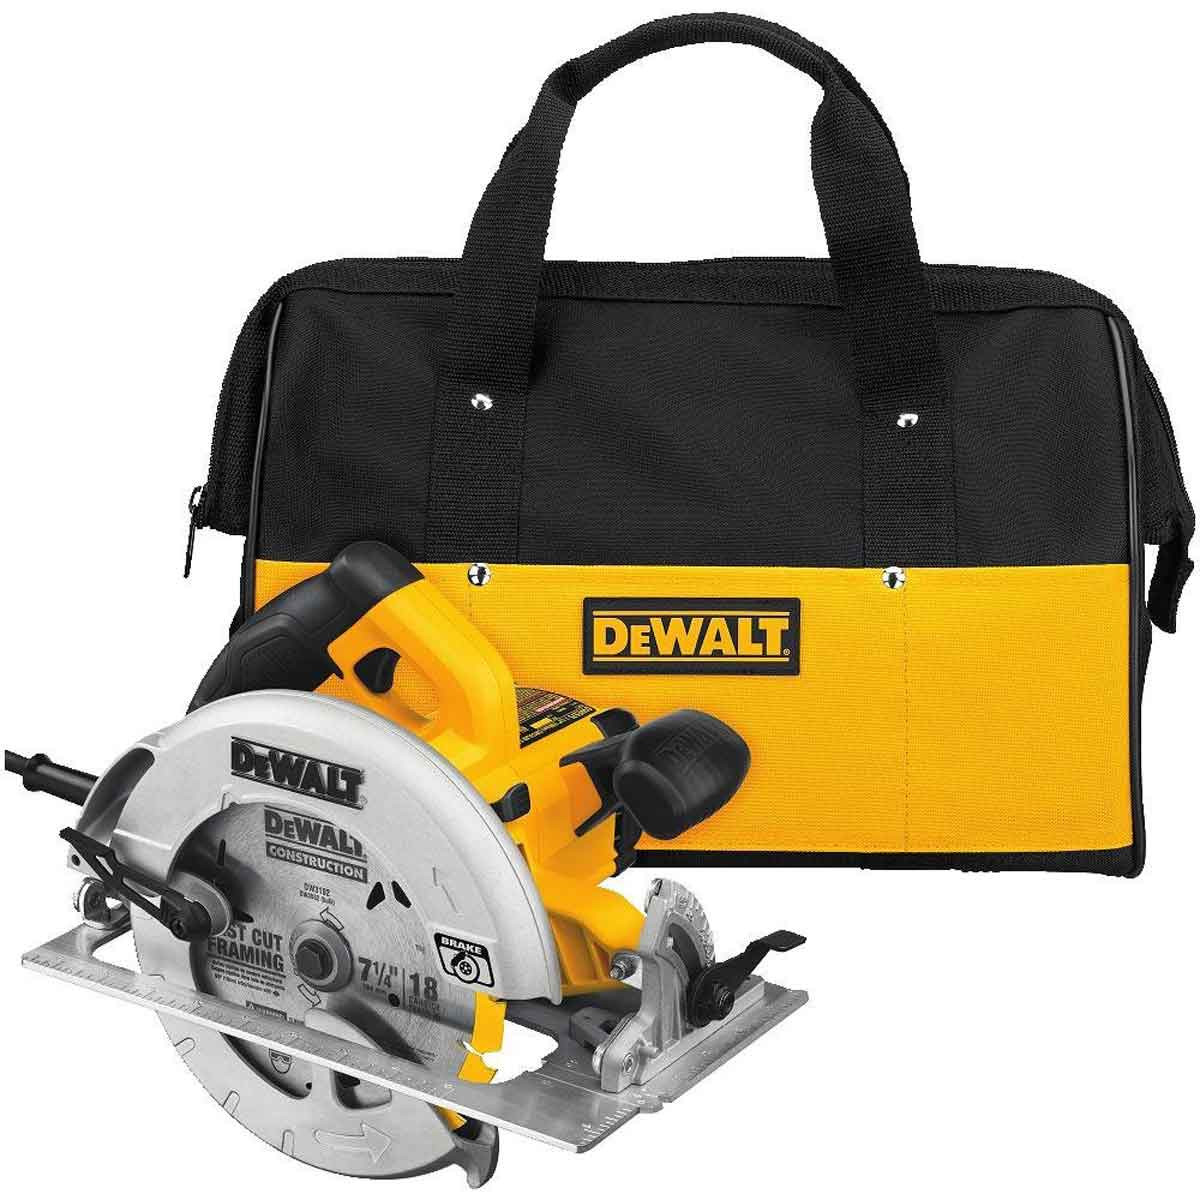 DWE575SB Dewalt light Circular Saw